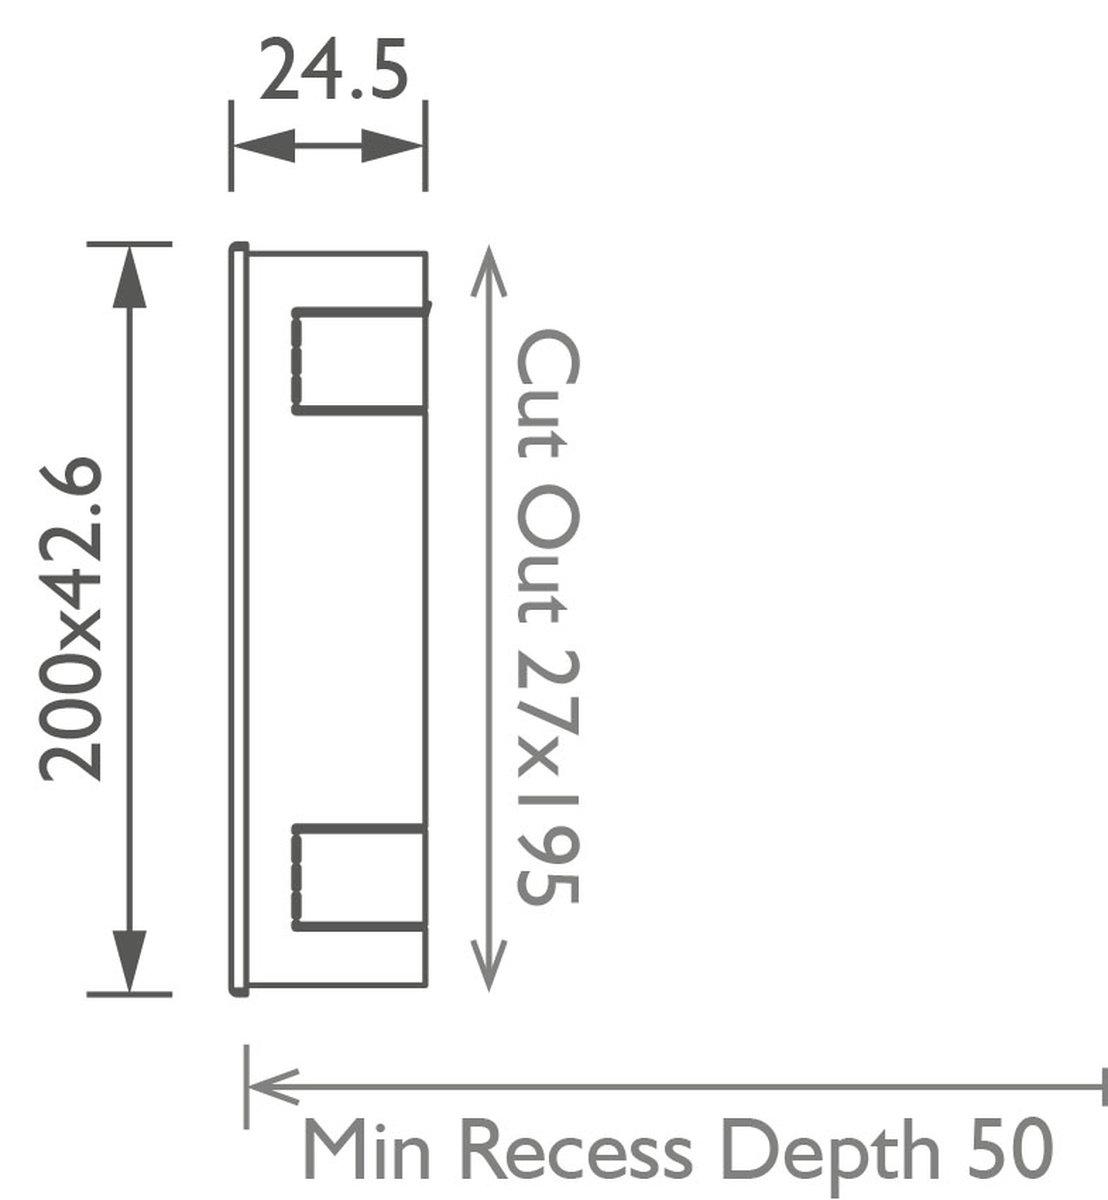 Manhattan Steplight technical image